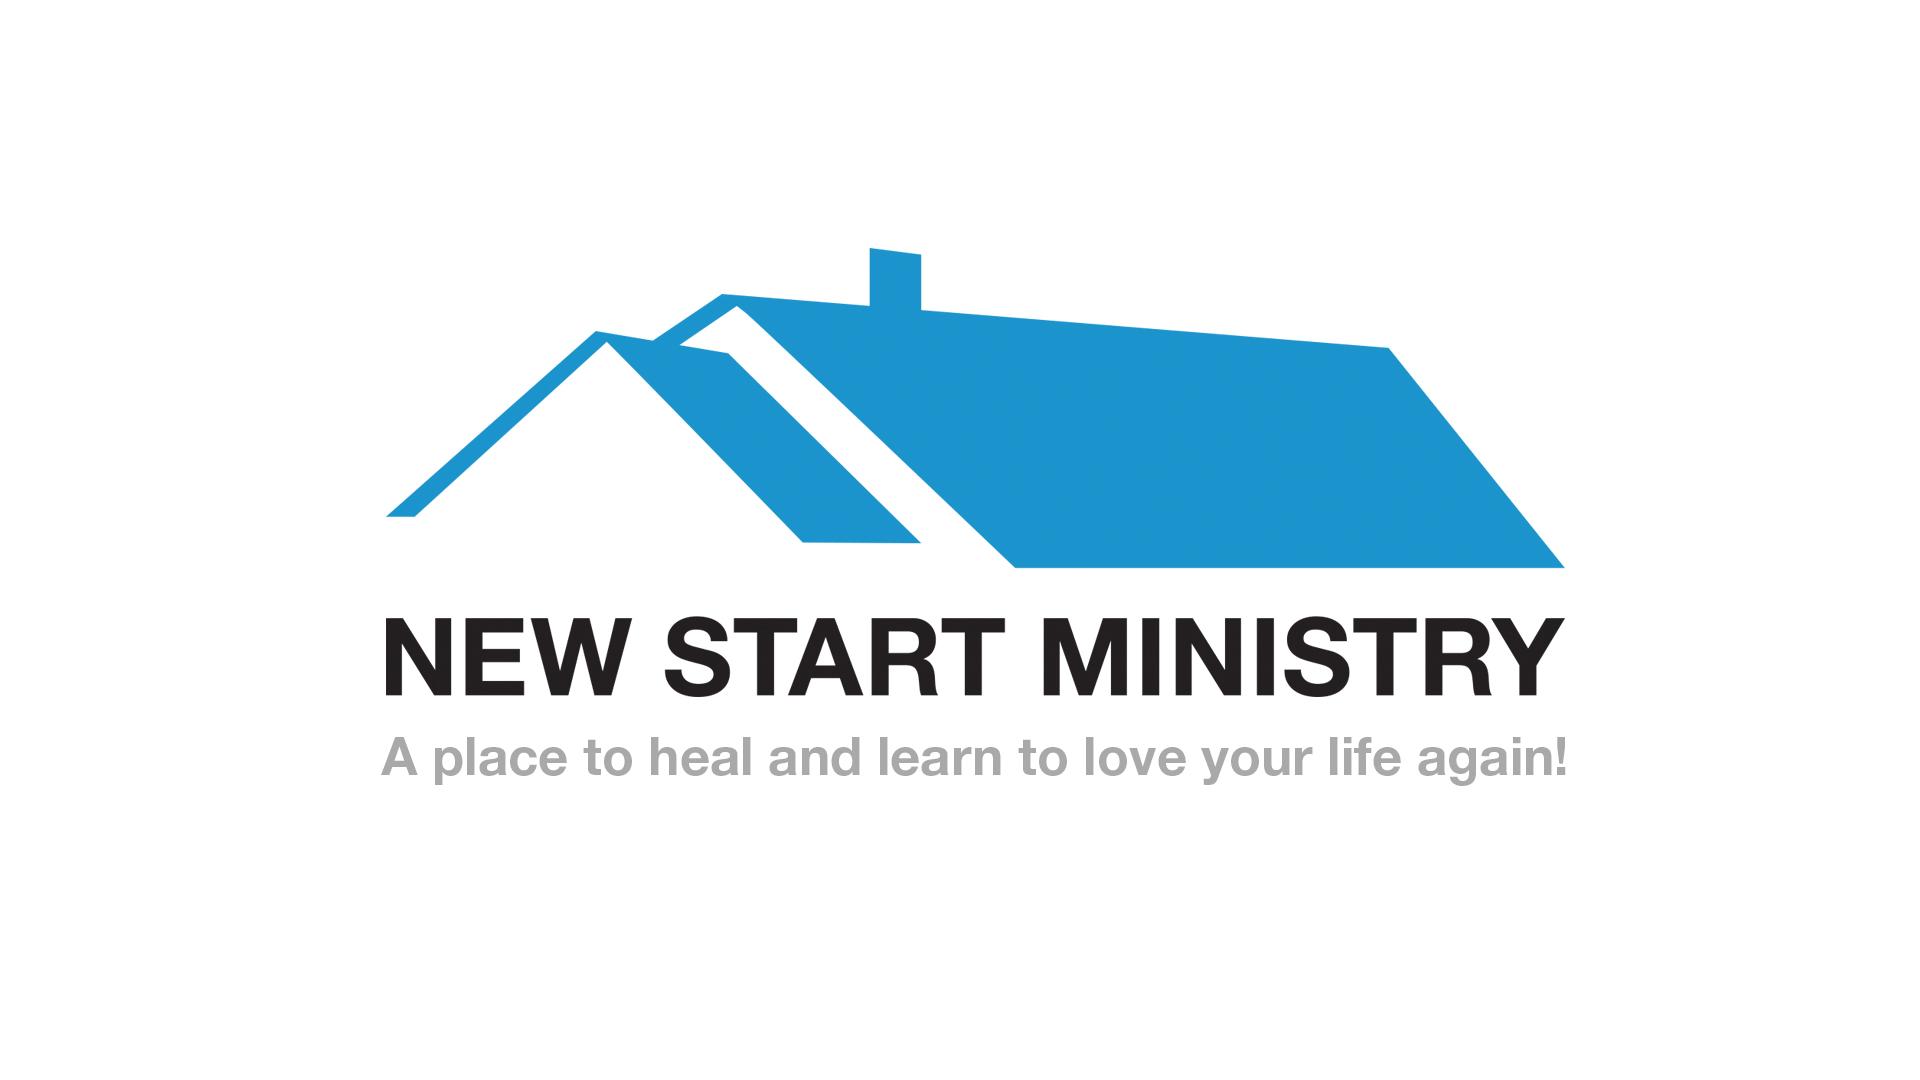 Crossroads New Start Ministry